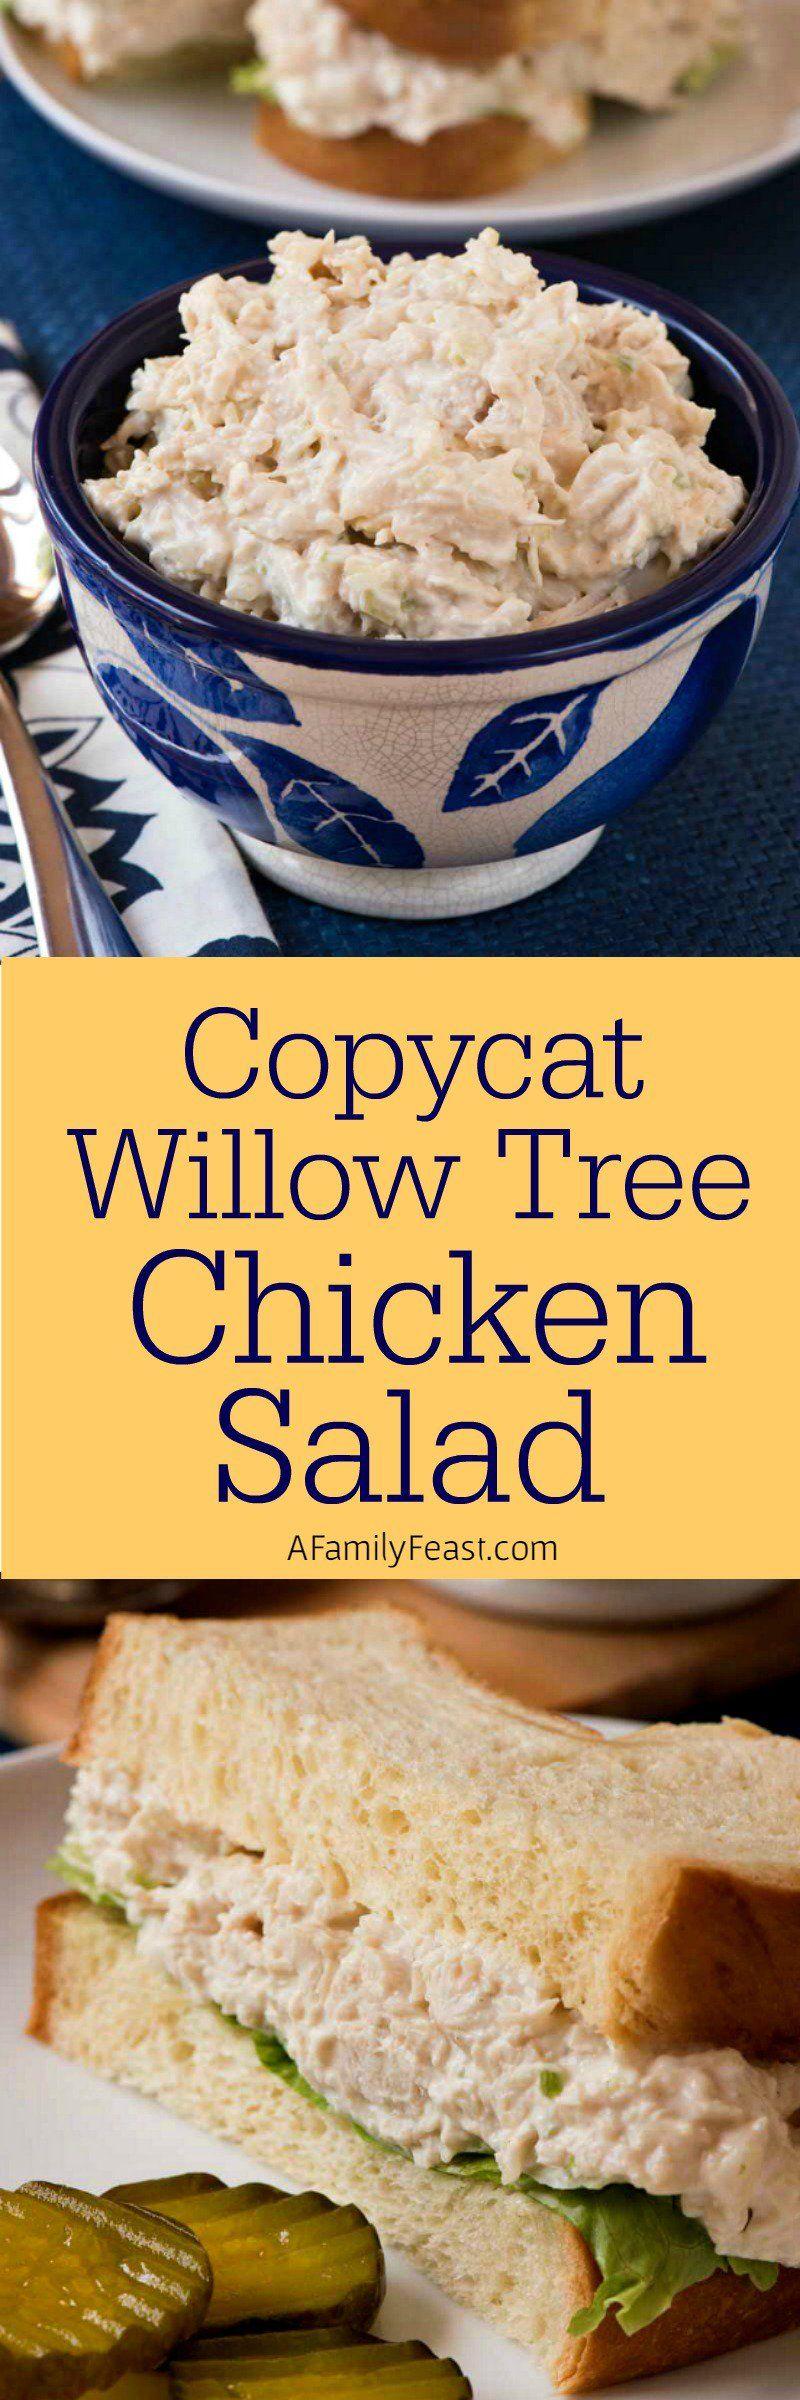 Copycat Willow Tree Chicken Salad Recipe Recipes